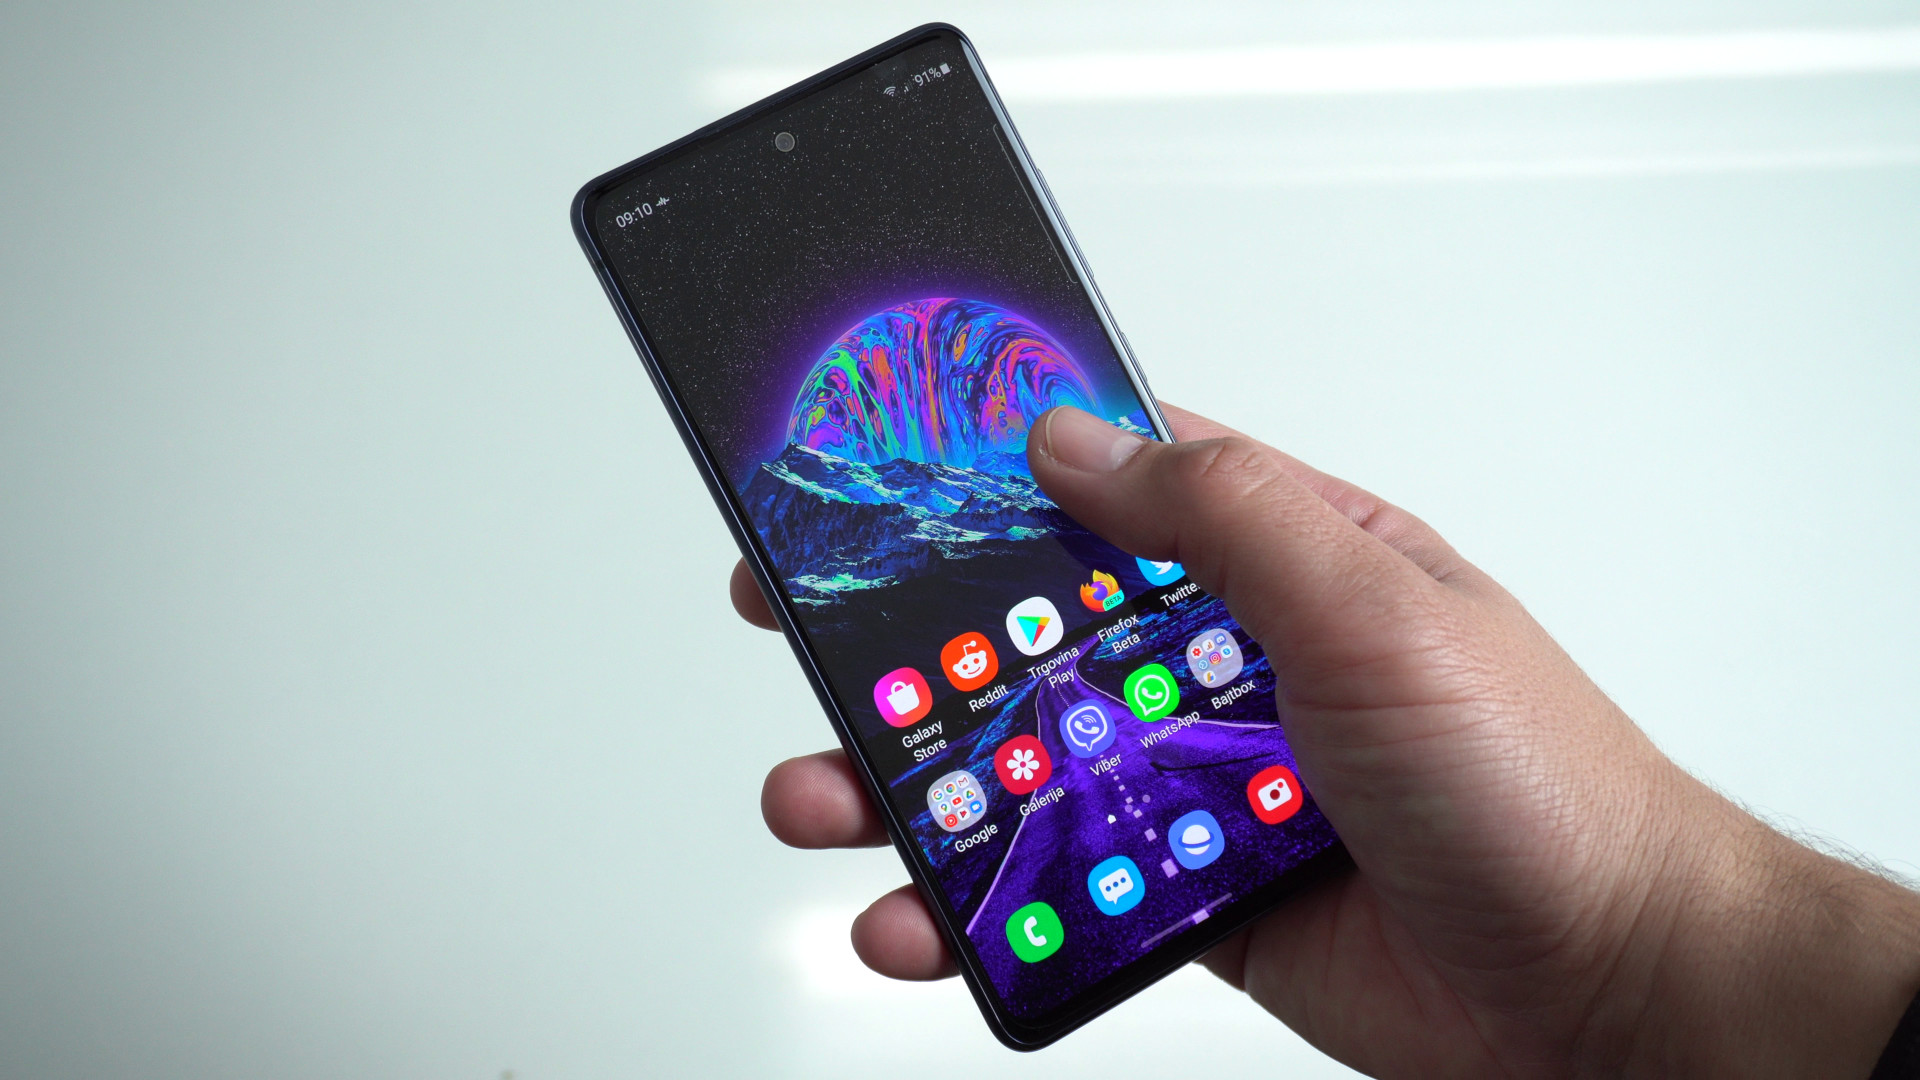 Moj novi telefon! Samsung Galaxy S20 FE prvi dojmovi